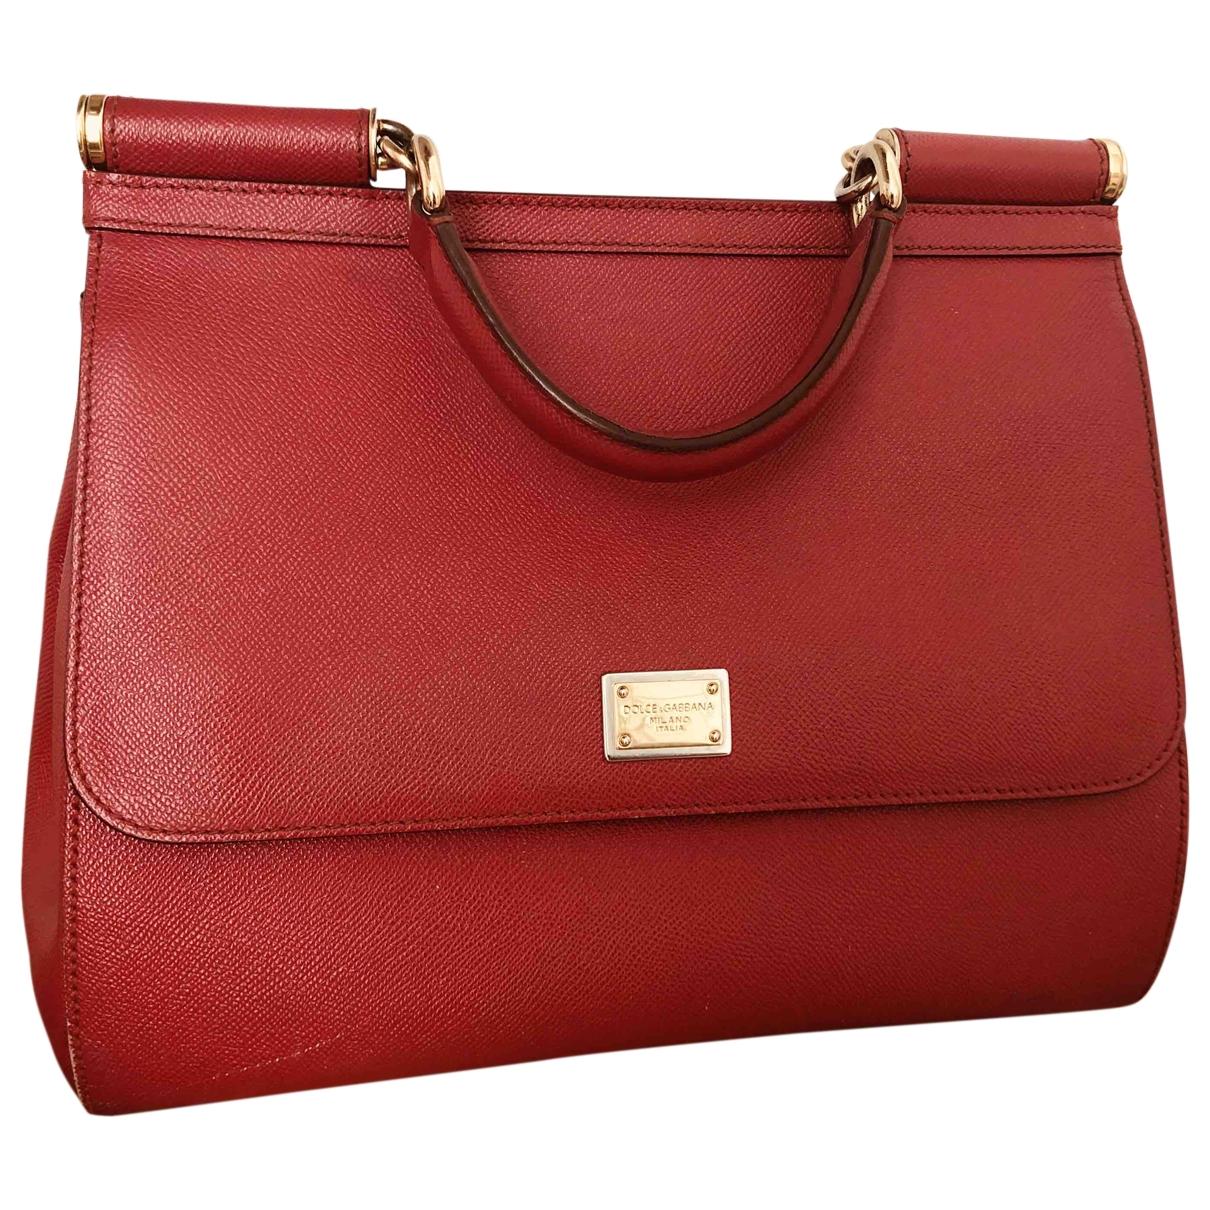 Dolce & Gabbana Sicily Handtasche in  Rot Leder